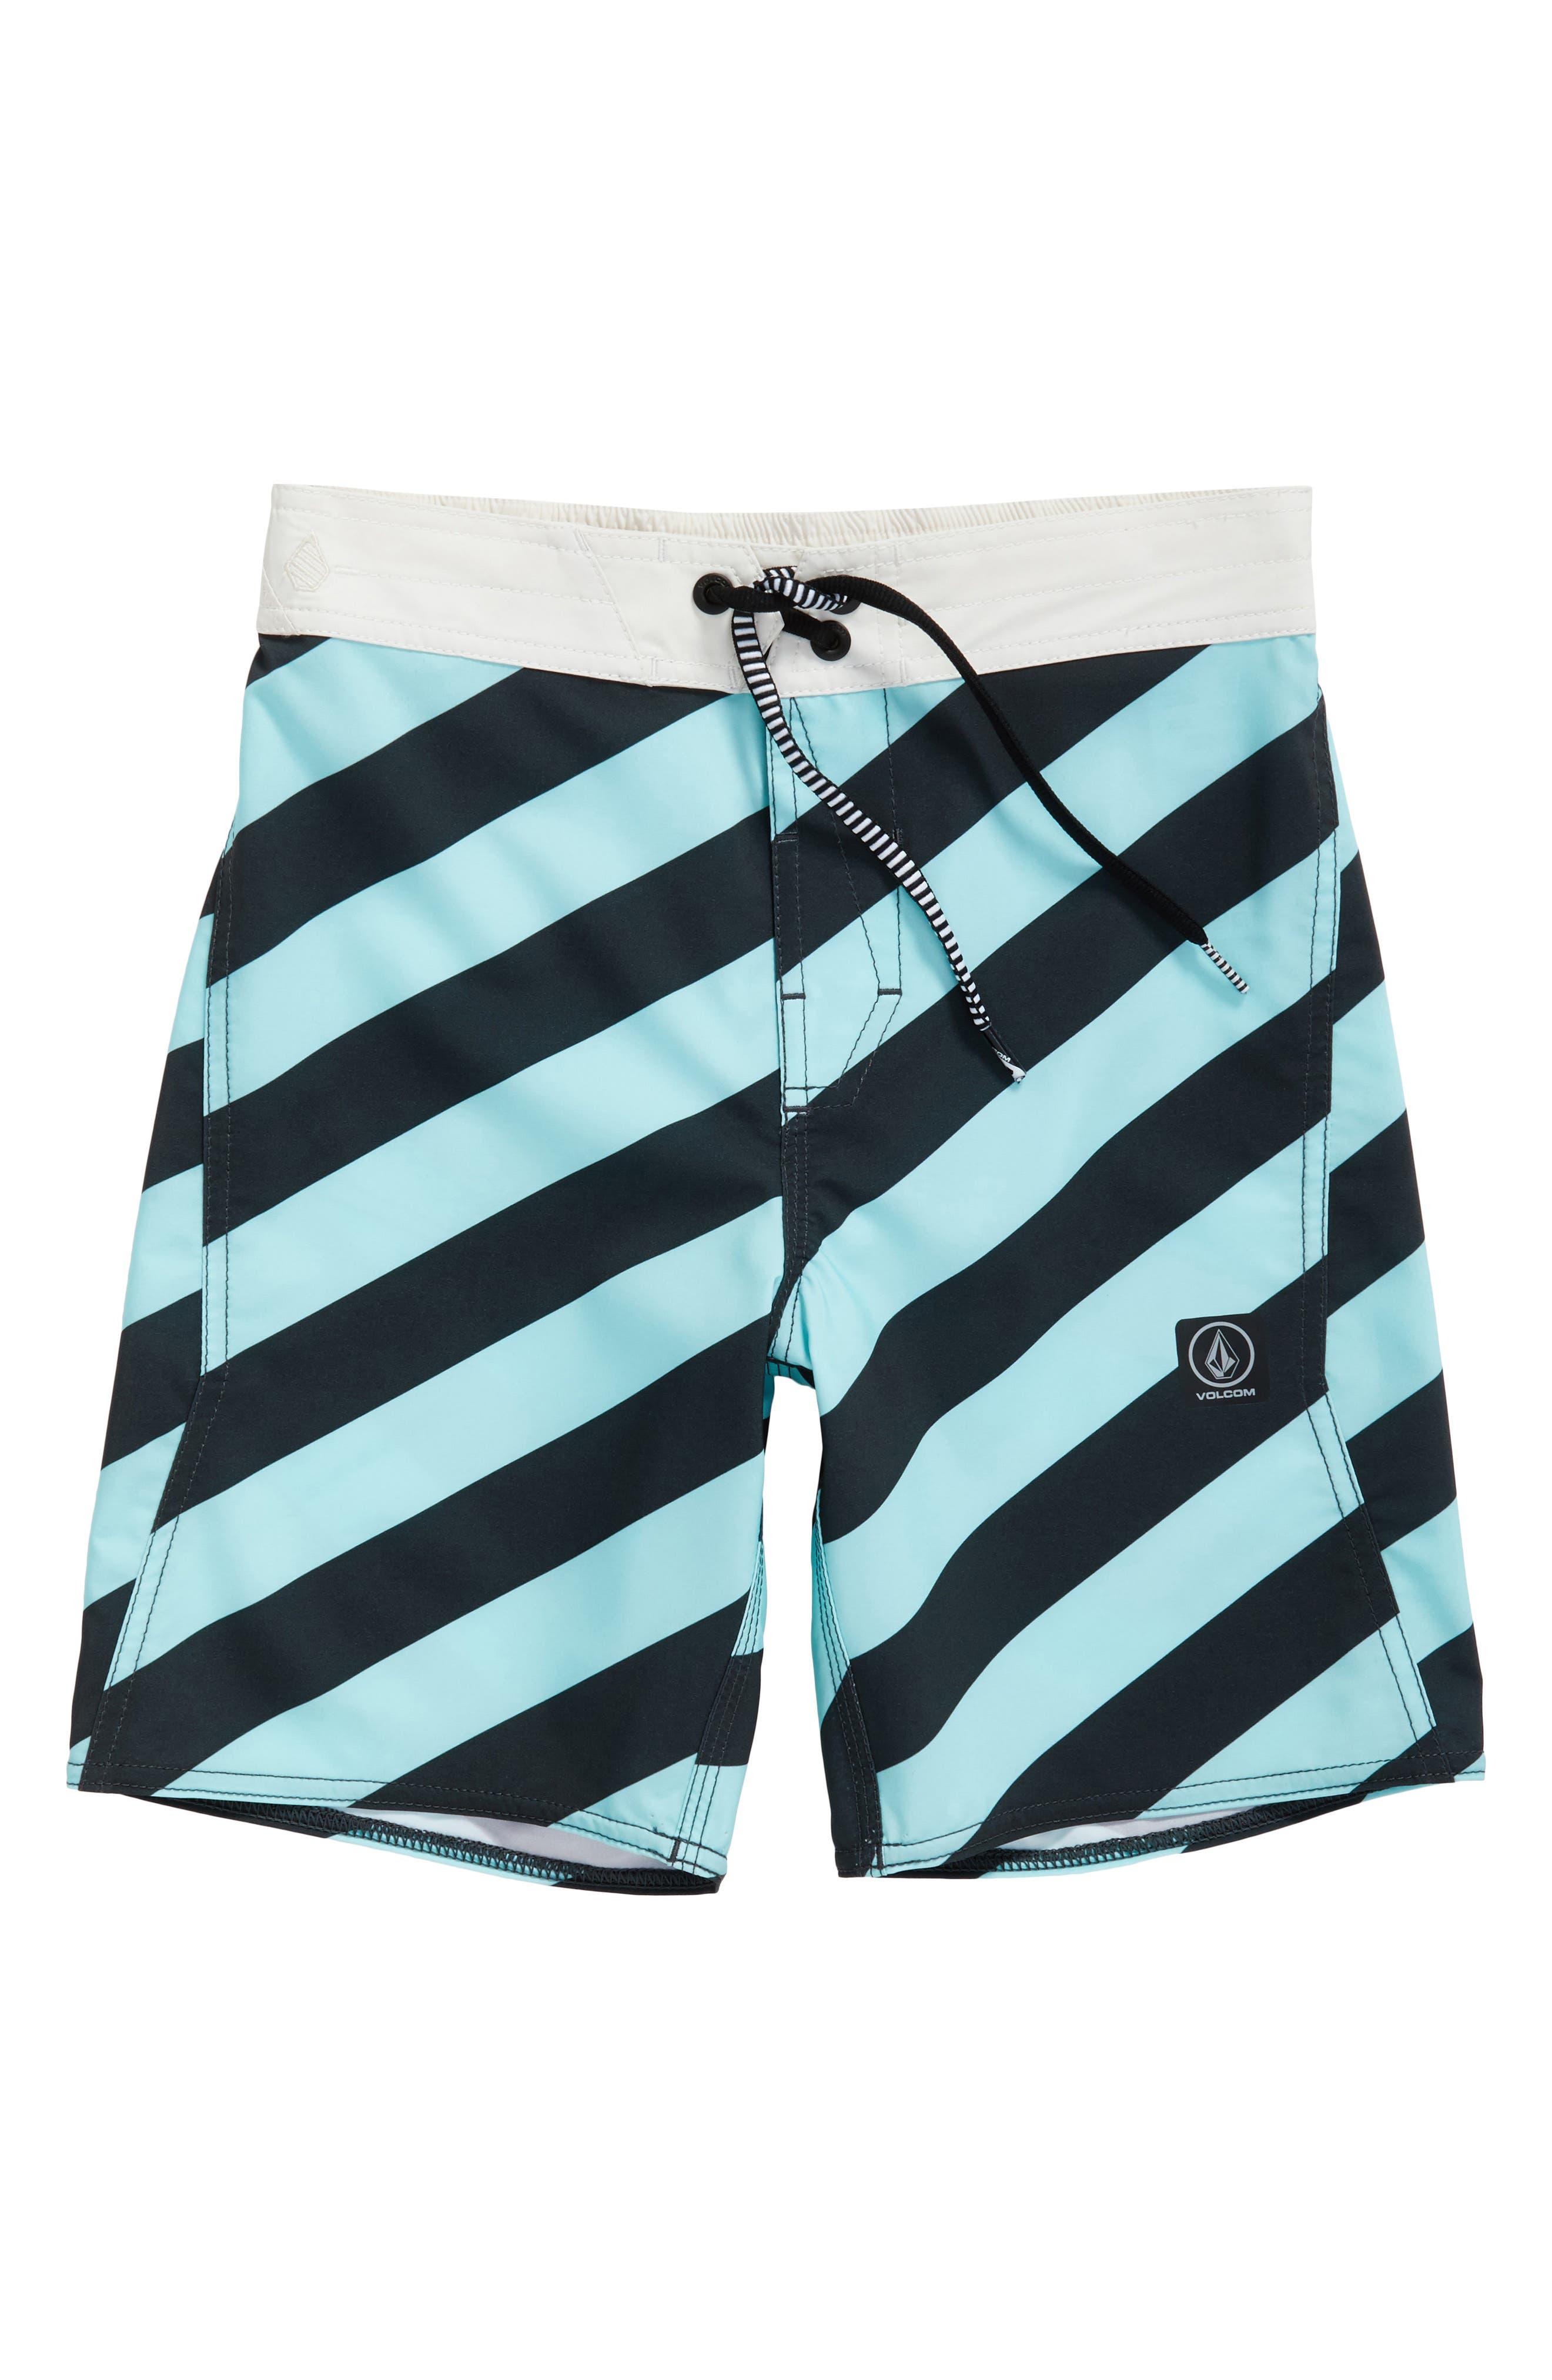 Main Image - Volcom Stripey Swim Trunks (Big Boys)